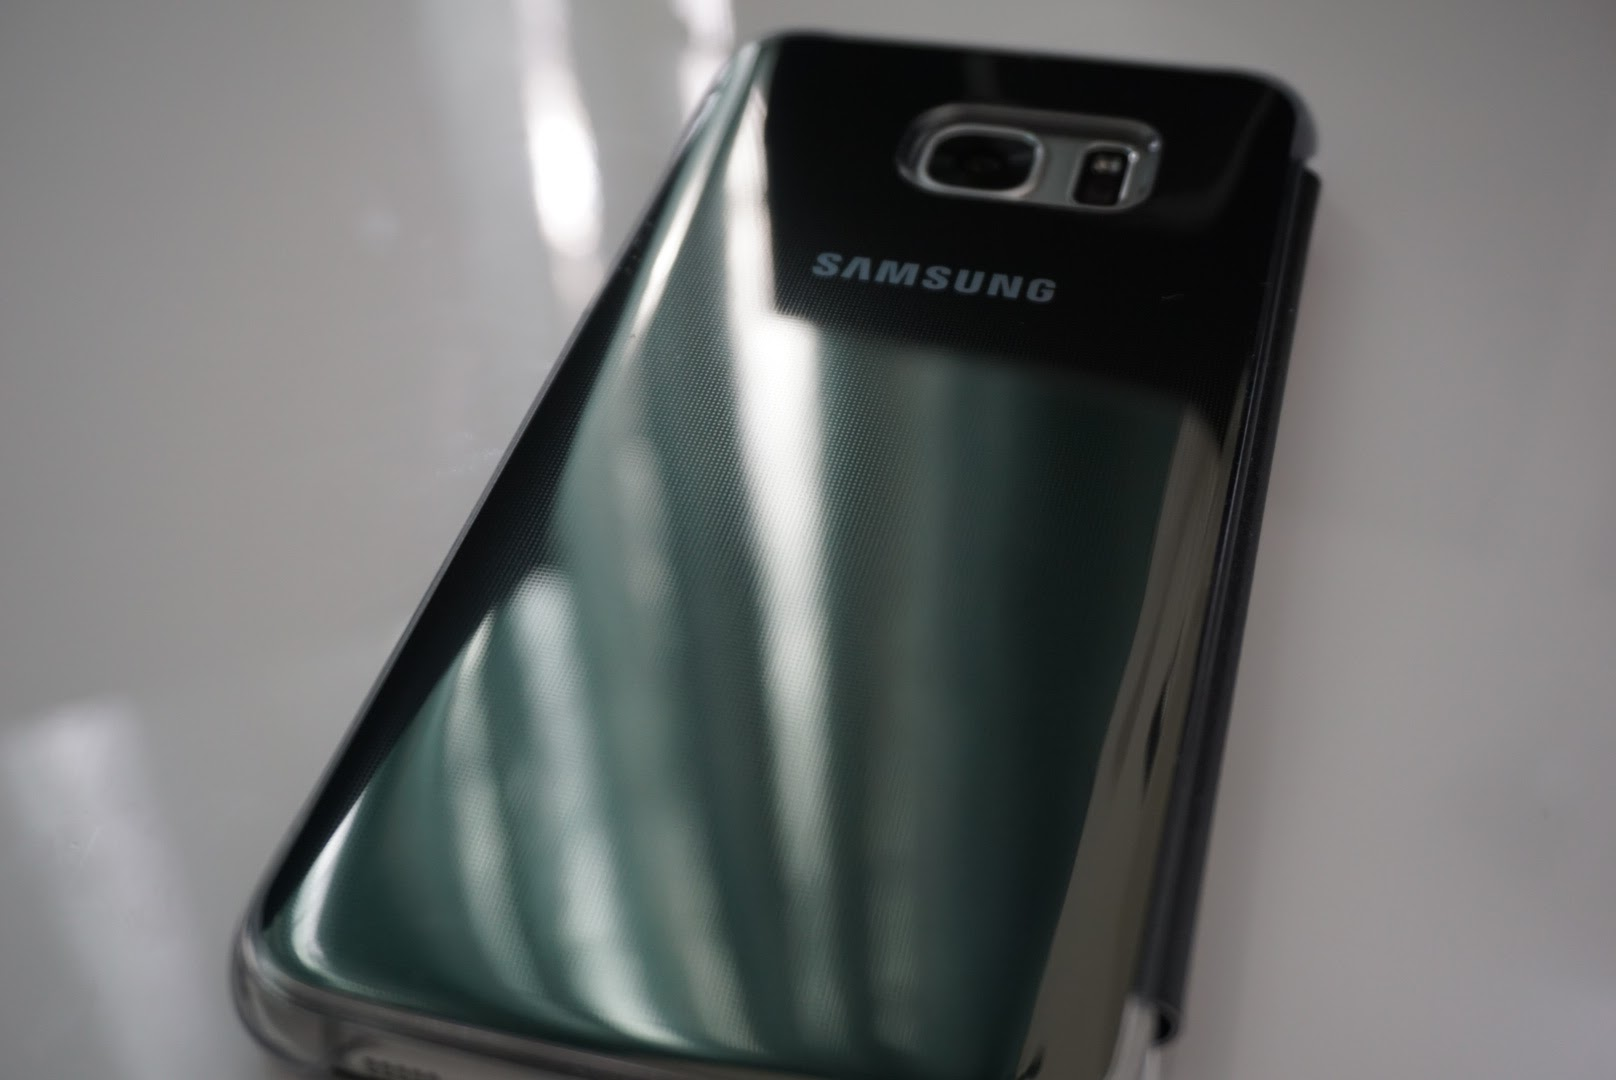 S7 edge S-View Flip Cover.